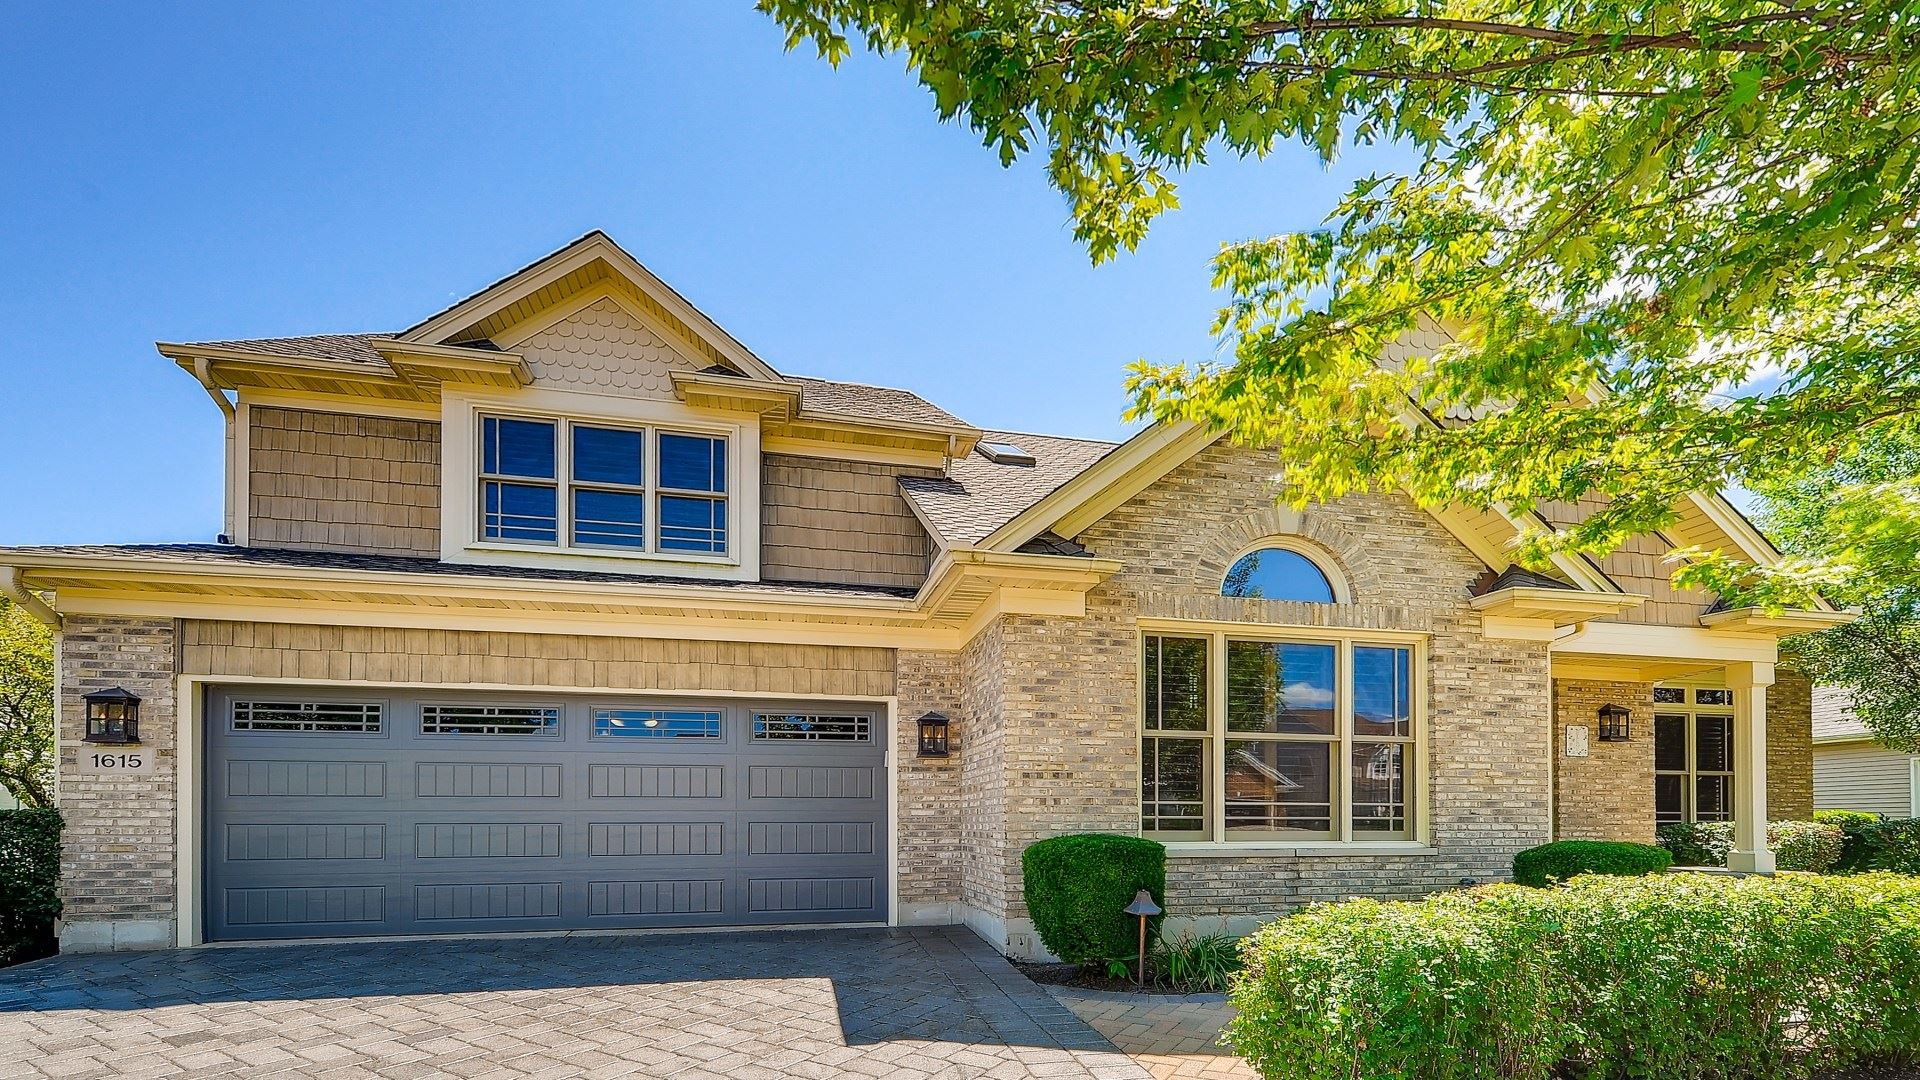 1615 Crowfoot Circle S, Hoffman Estates, IL 60169 - #: 10810742